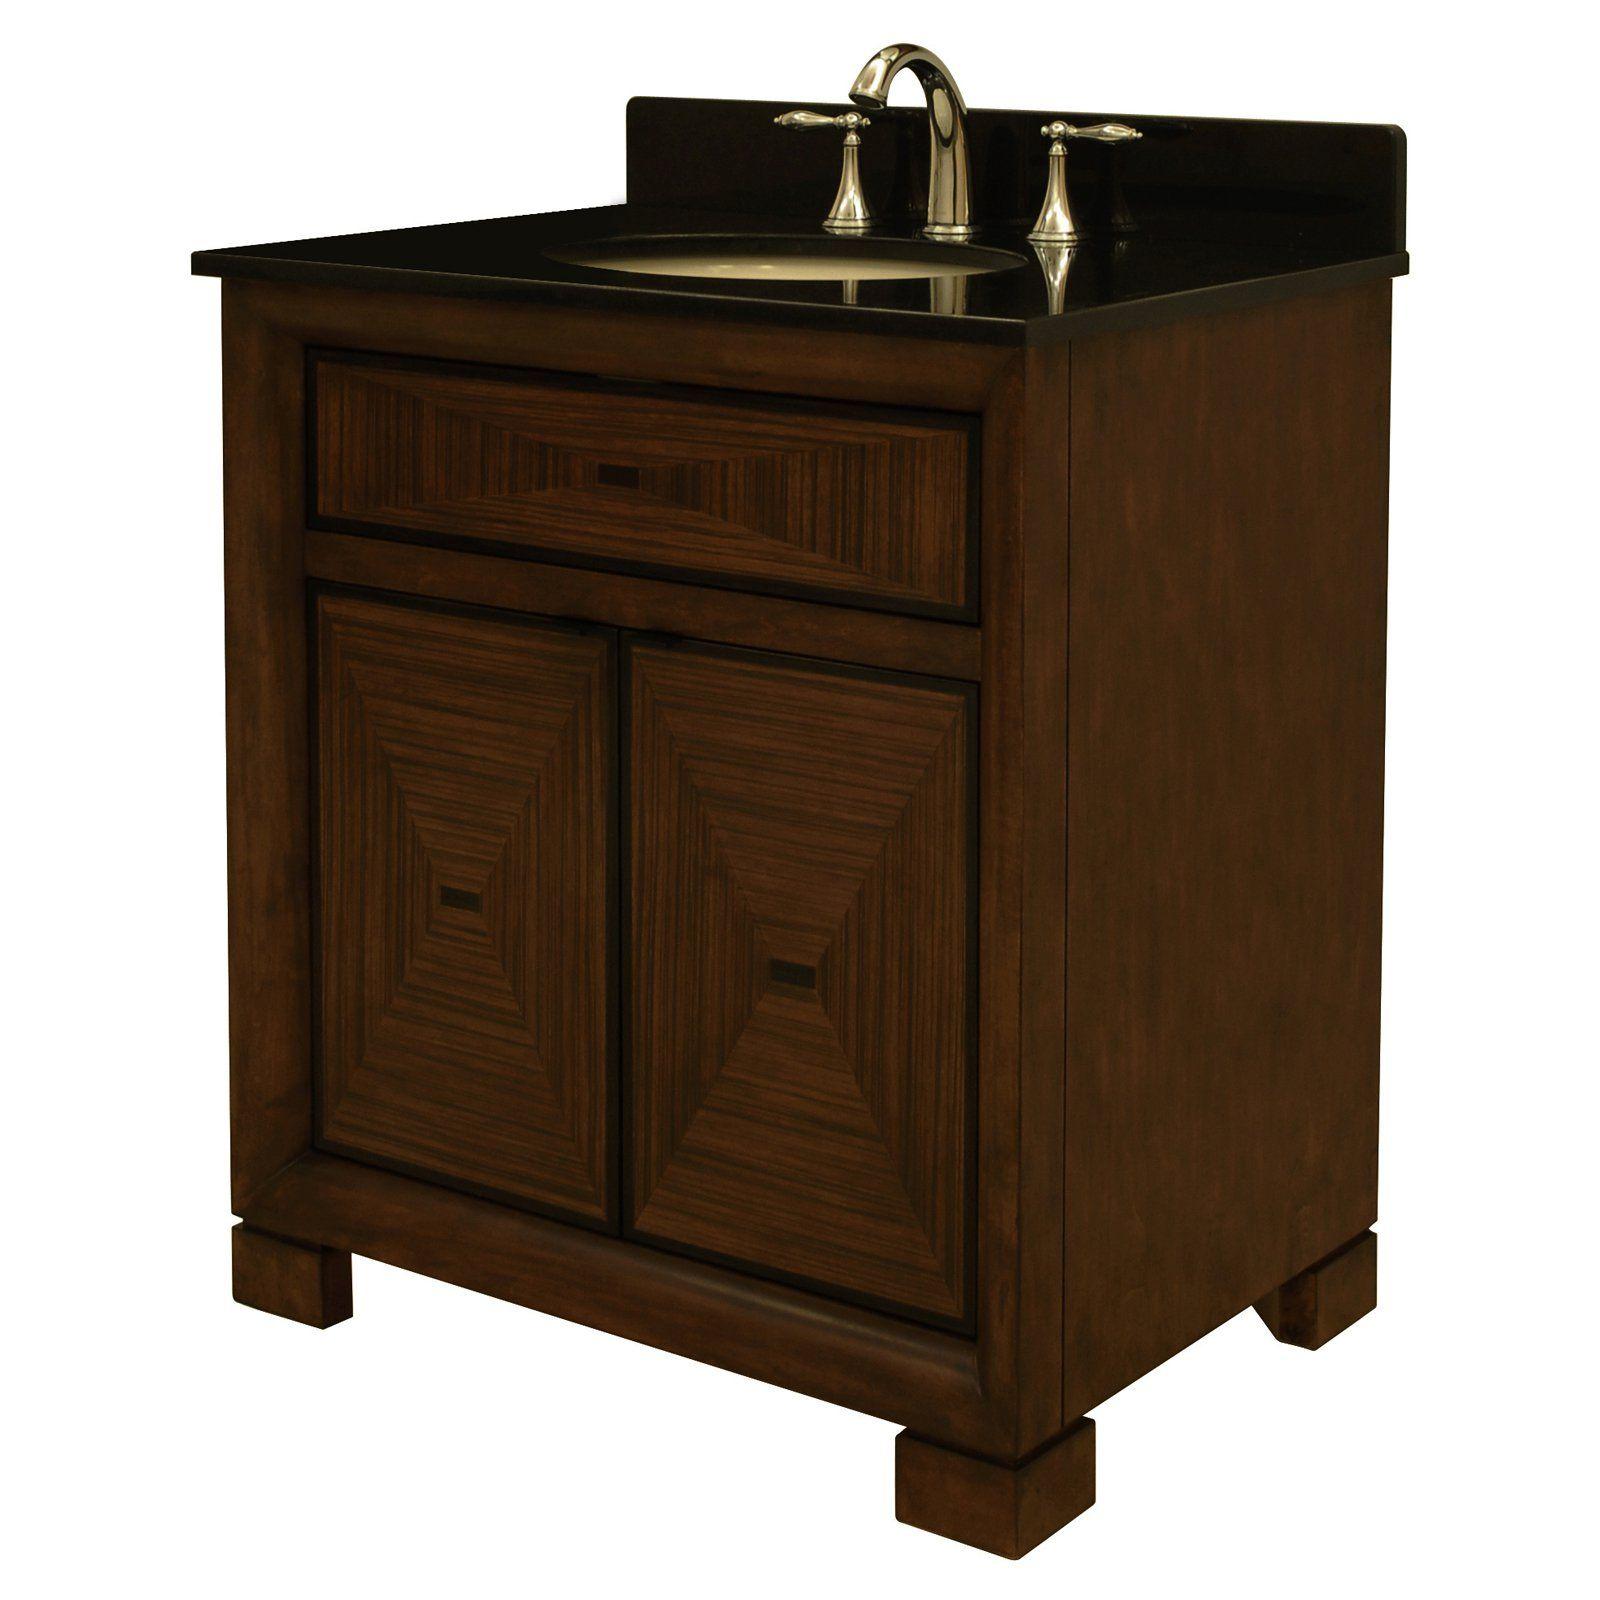 Sagehill Designs TP3021 Tempo 30 In. Single Bathroom Vanity   From  Hayneedle.com